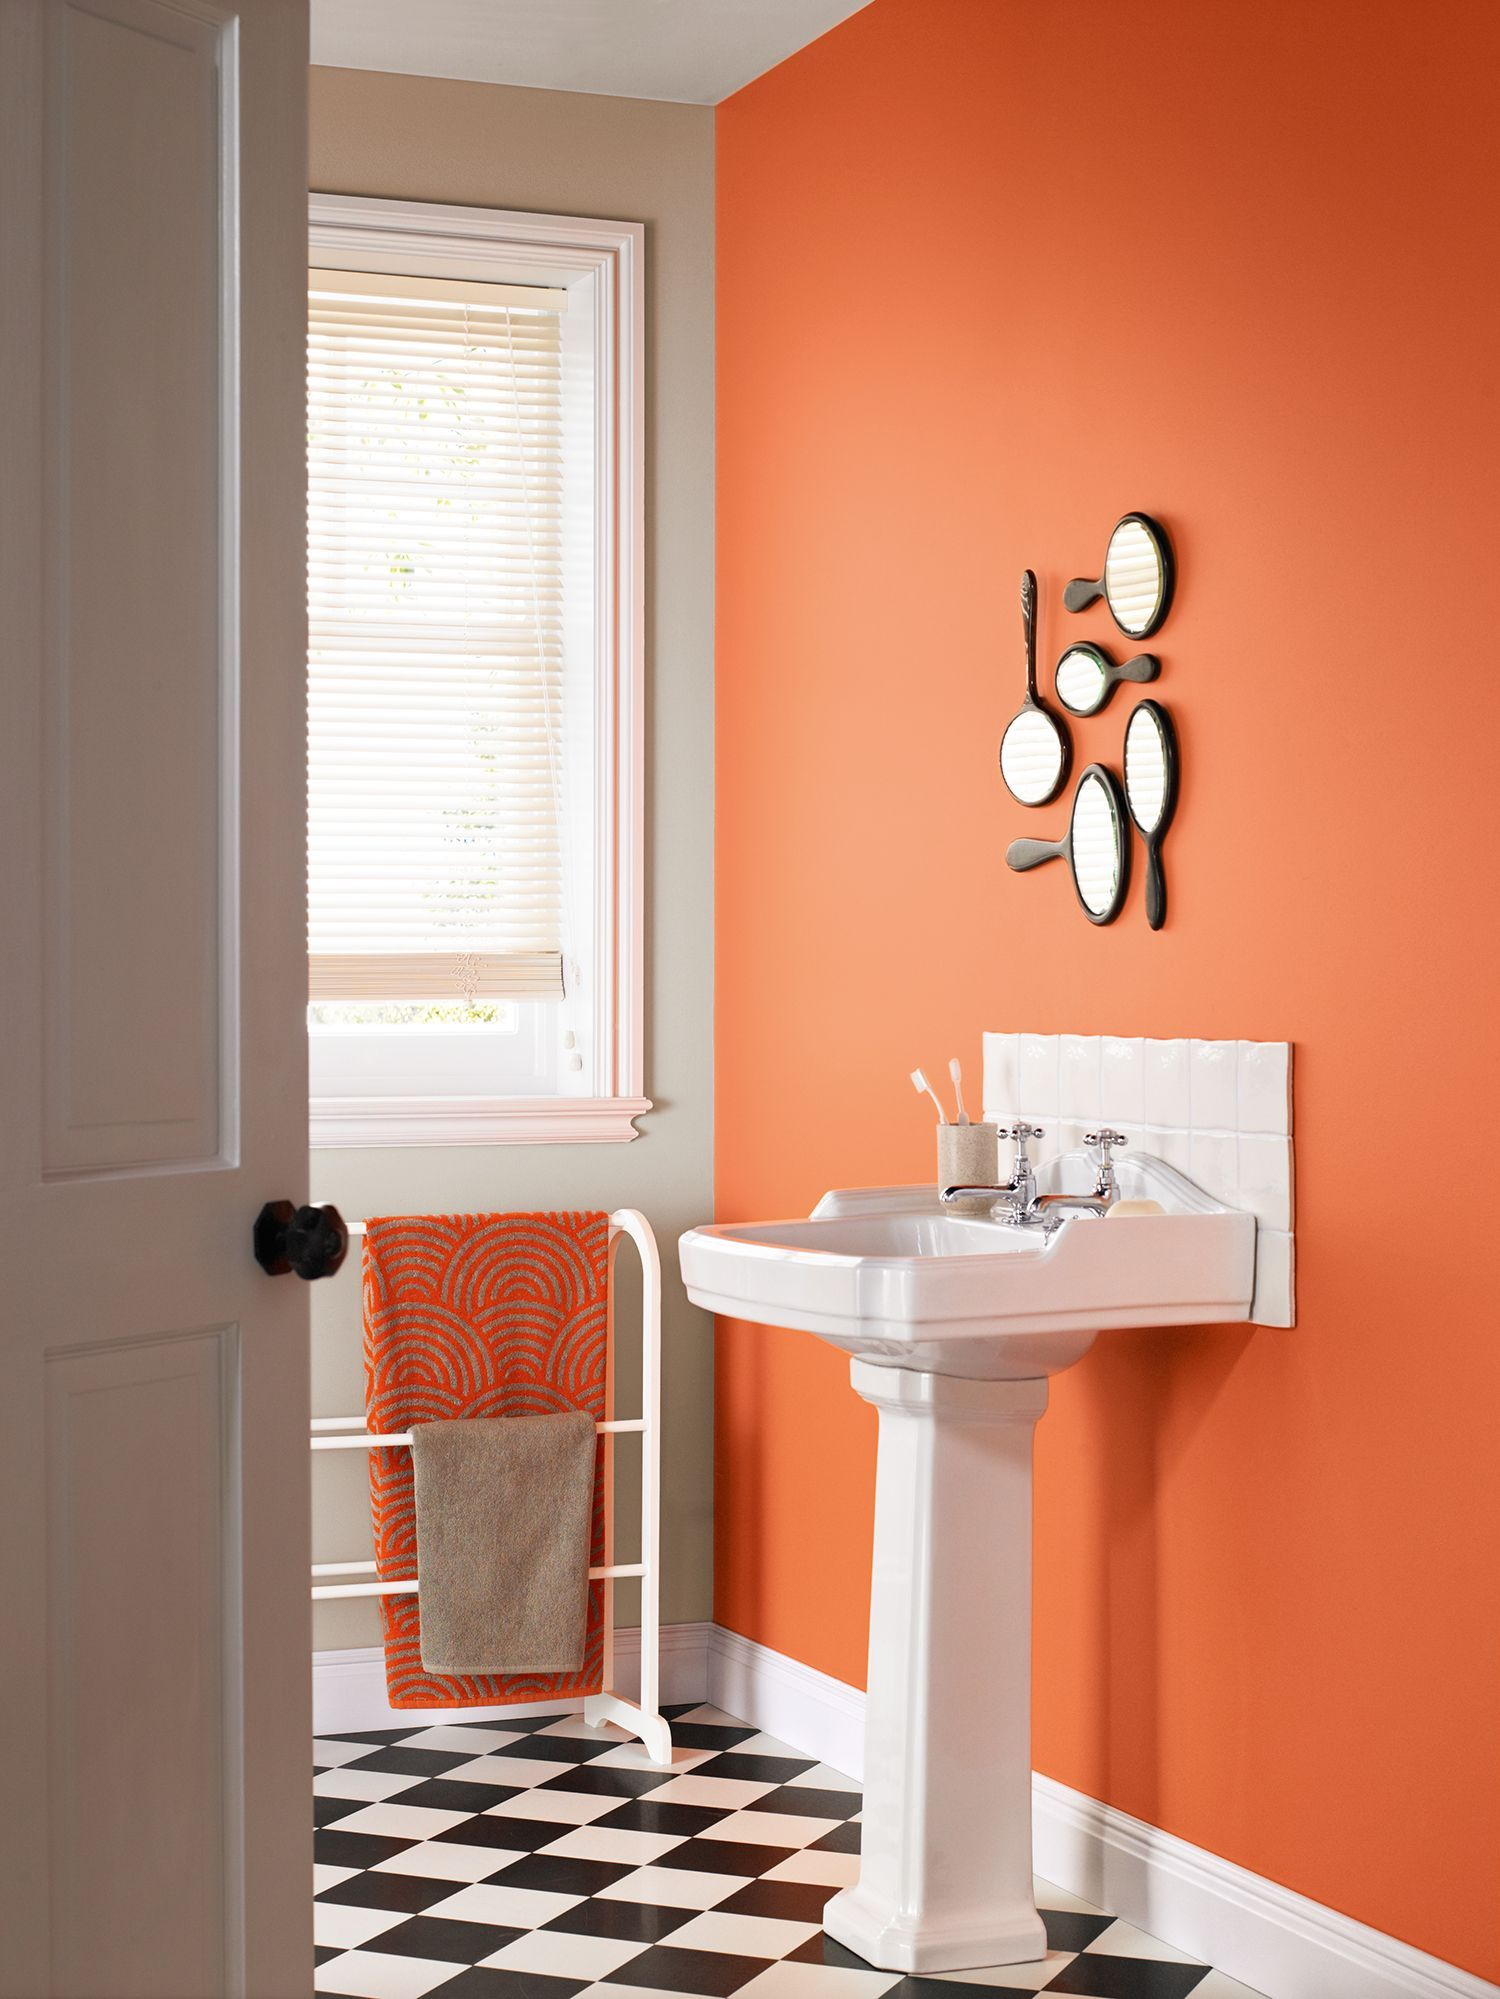 https://www.biologement.fr/img/cms/peinture%20salle%20de%20bain/orange.jpg